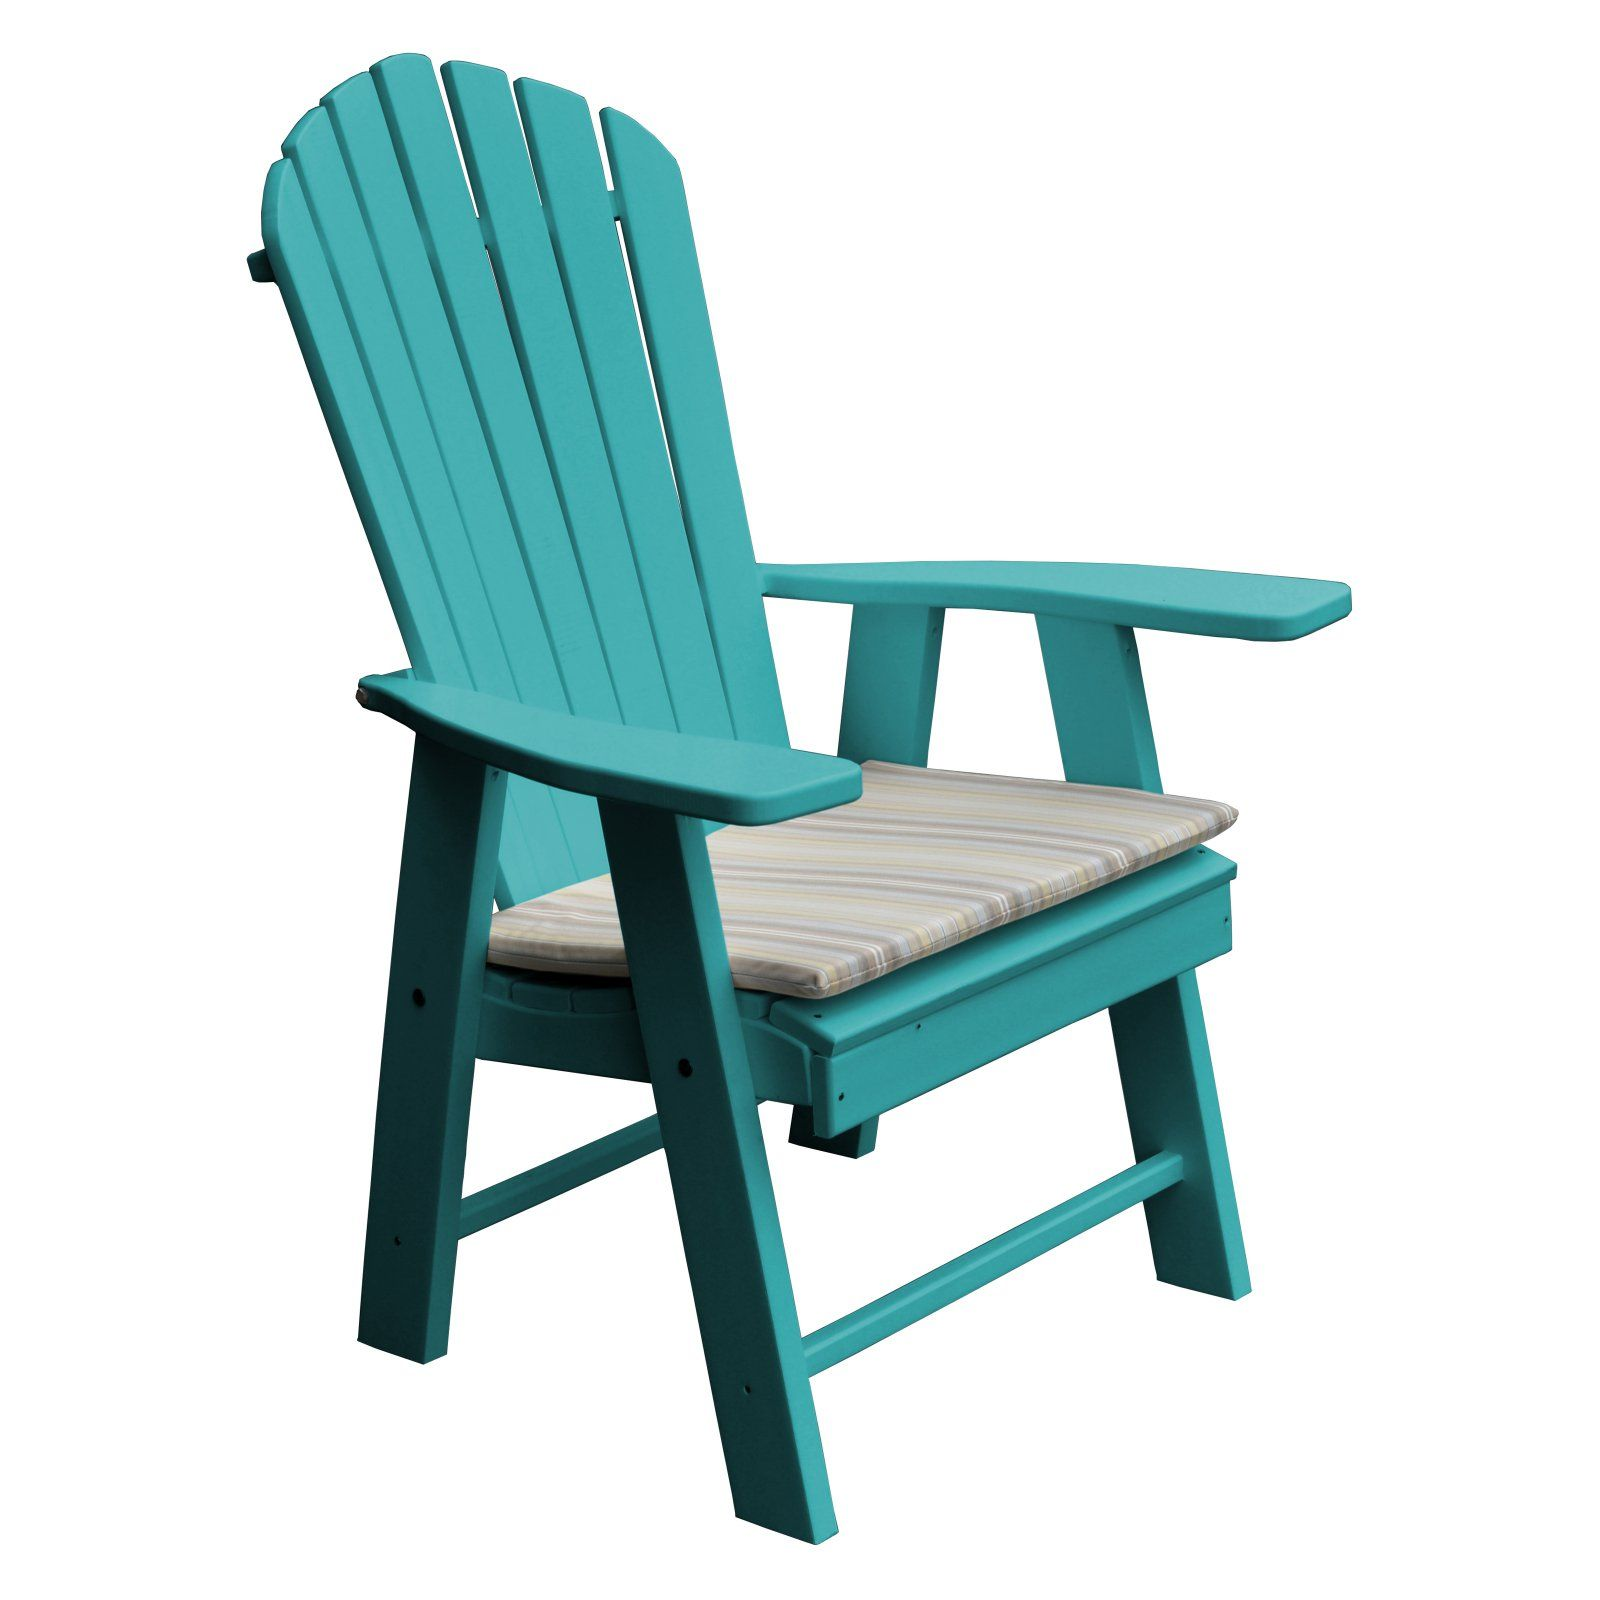 Outdoor Radionic Hi Tech Newport Recycled Plastic Adirondack Patio Chair White